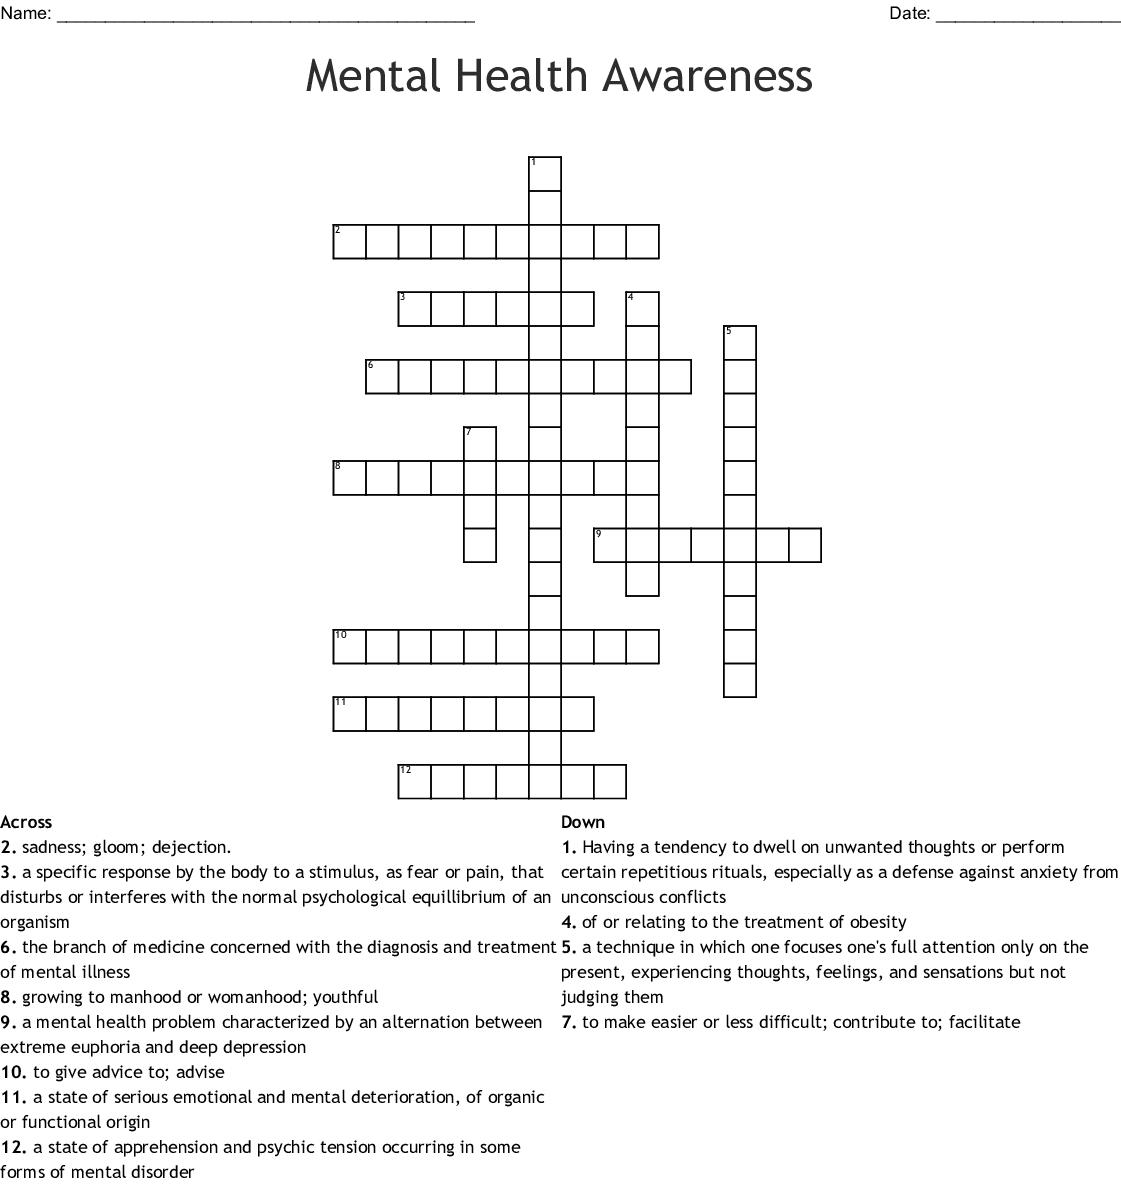 Mental Health Awareness Crossword - Wordmint - Printable Crossword Puzzles For Mental Health